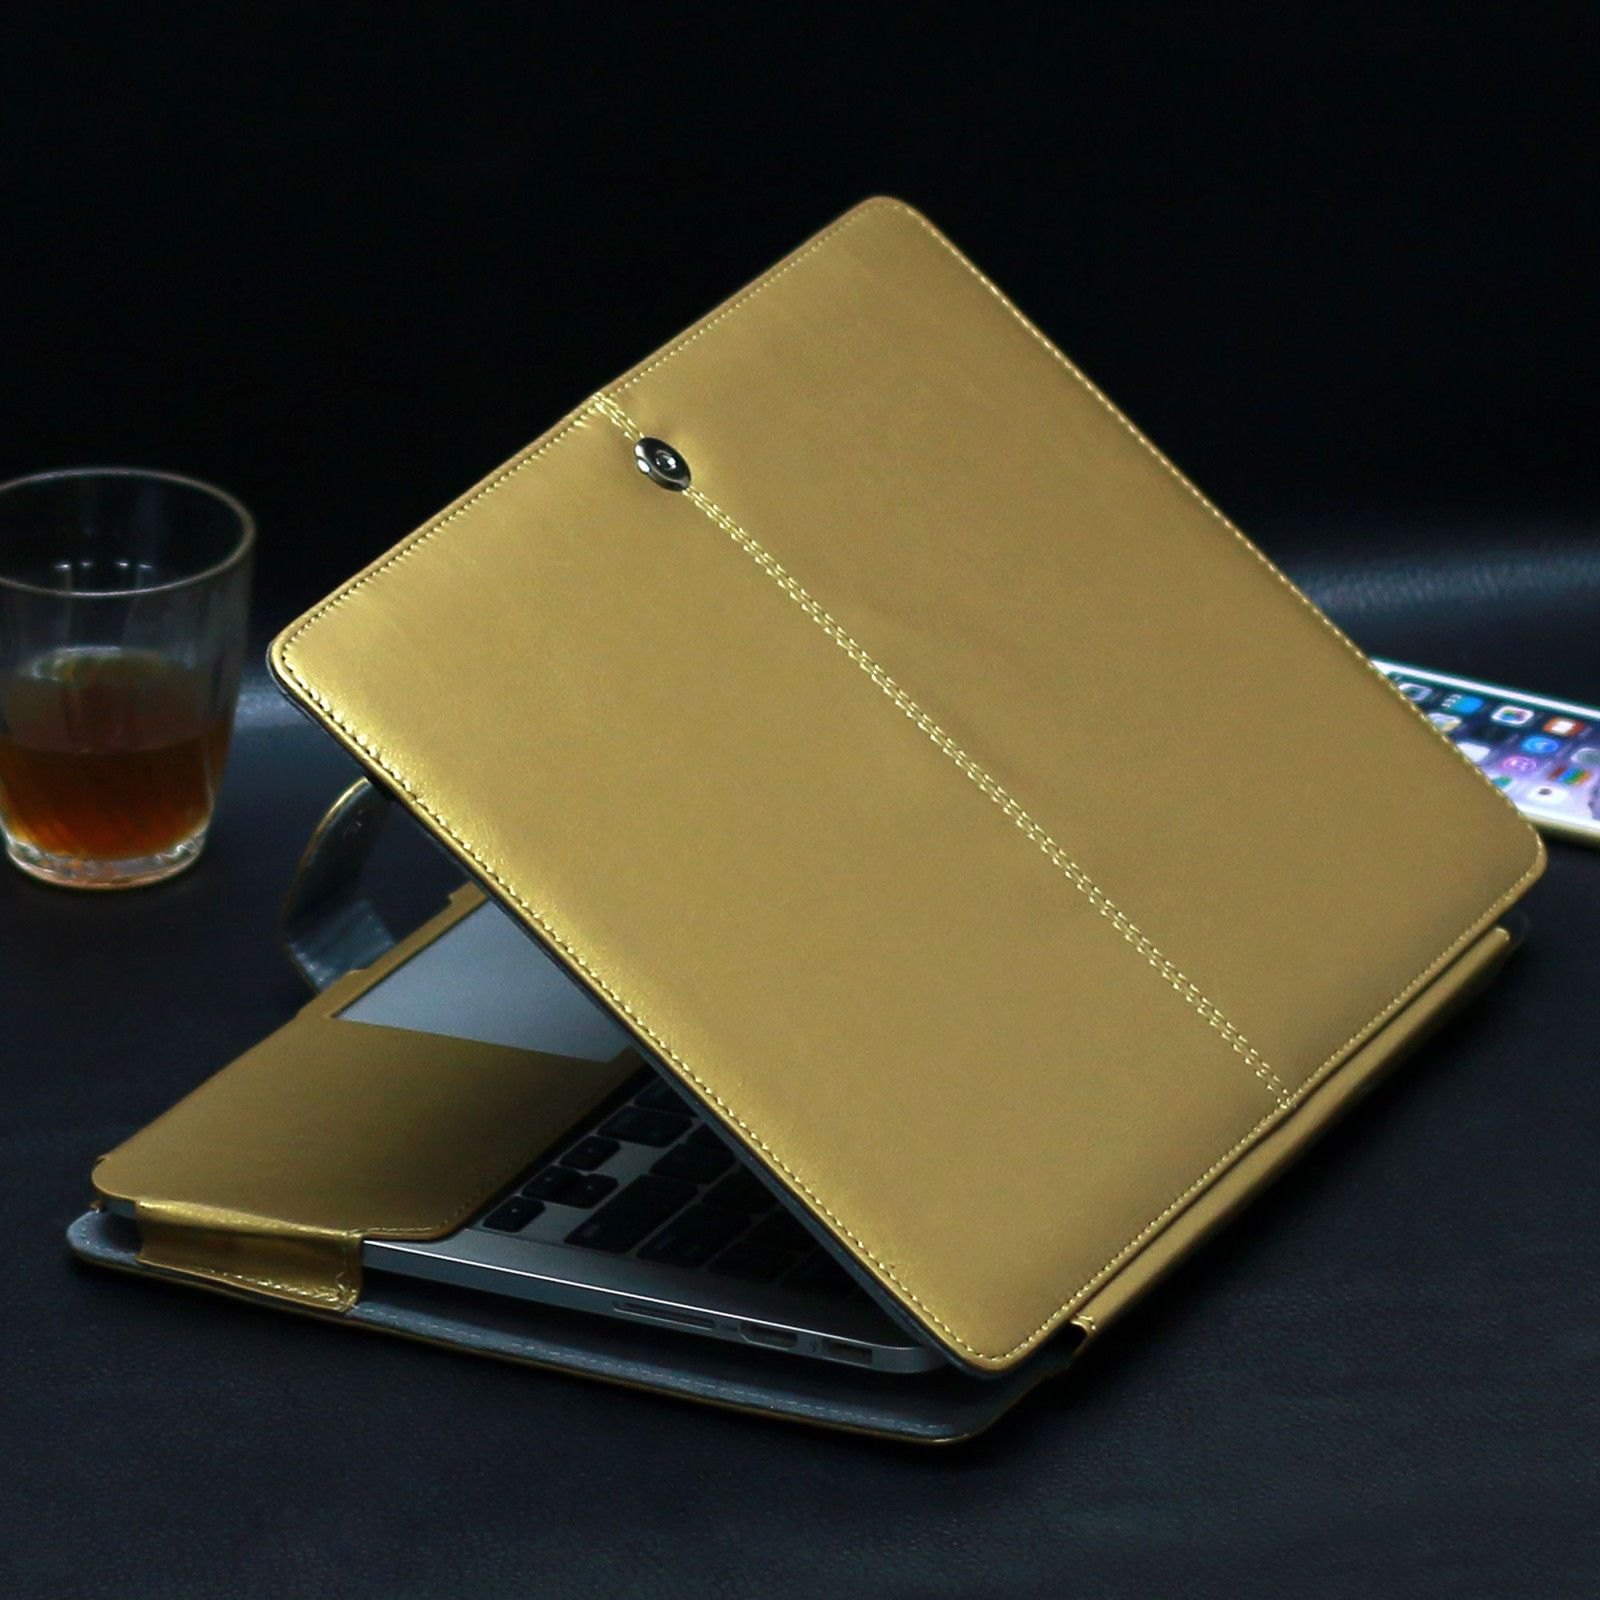 pu leather laptop sleeve bag case cover for macbook pro 13 air 13 rh pinterest com